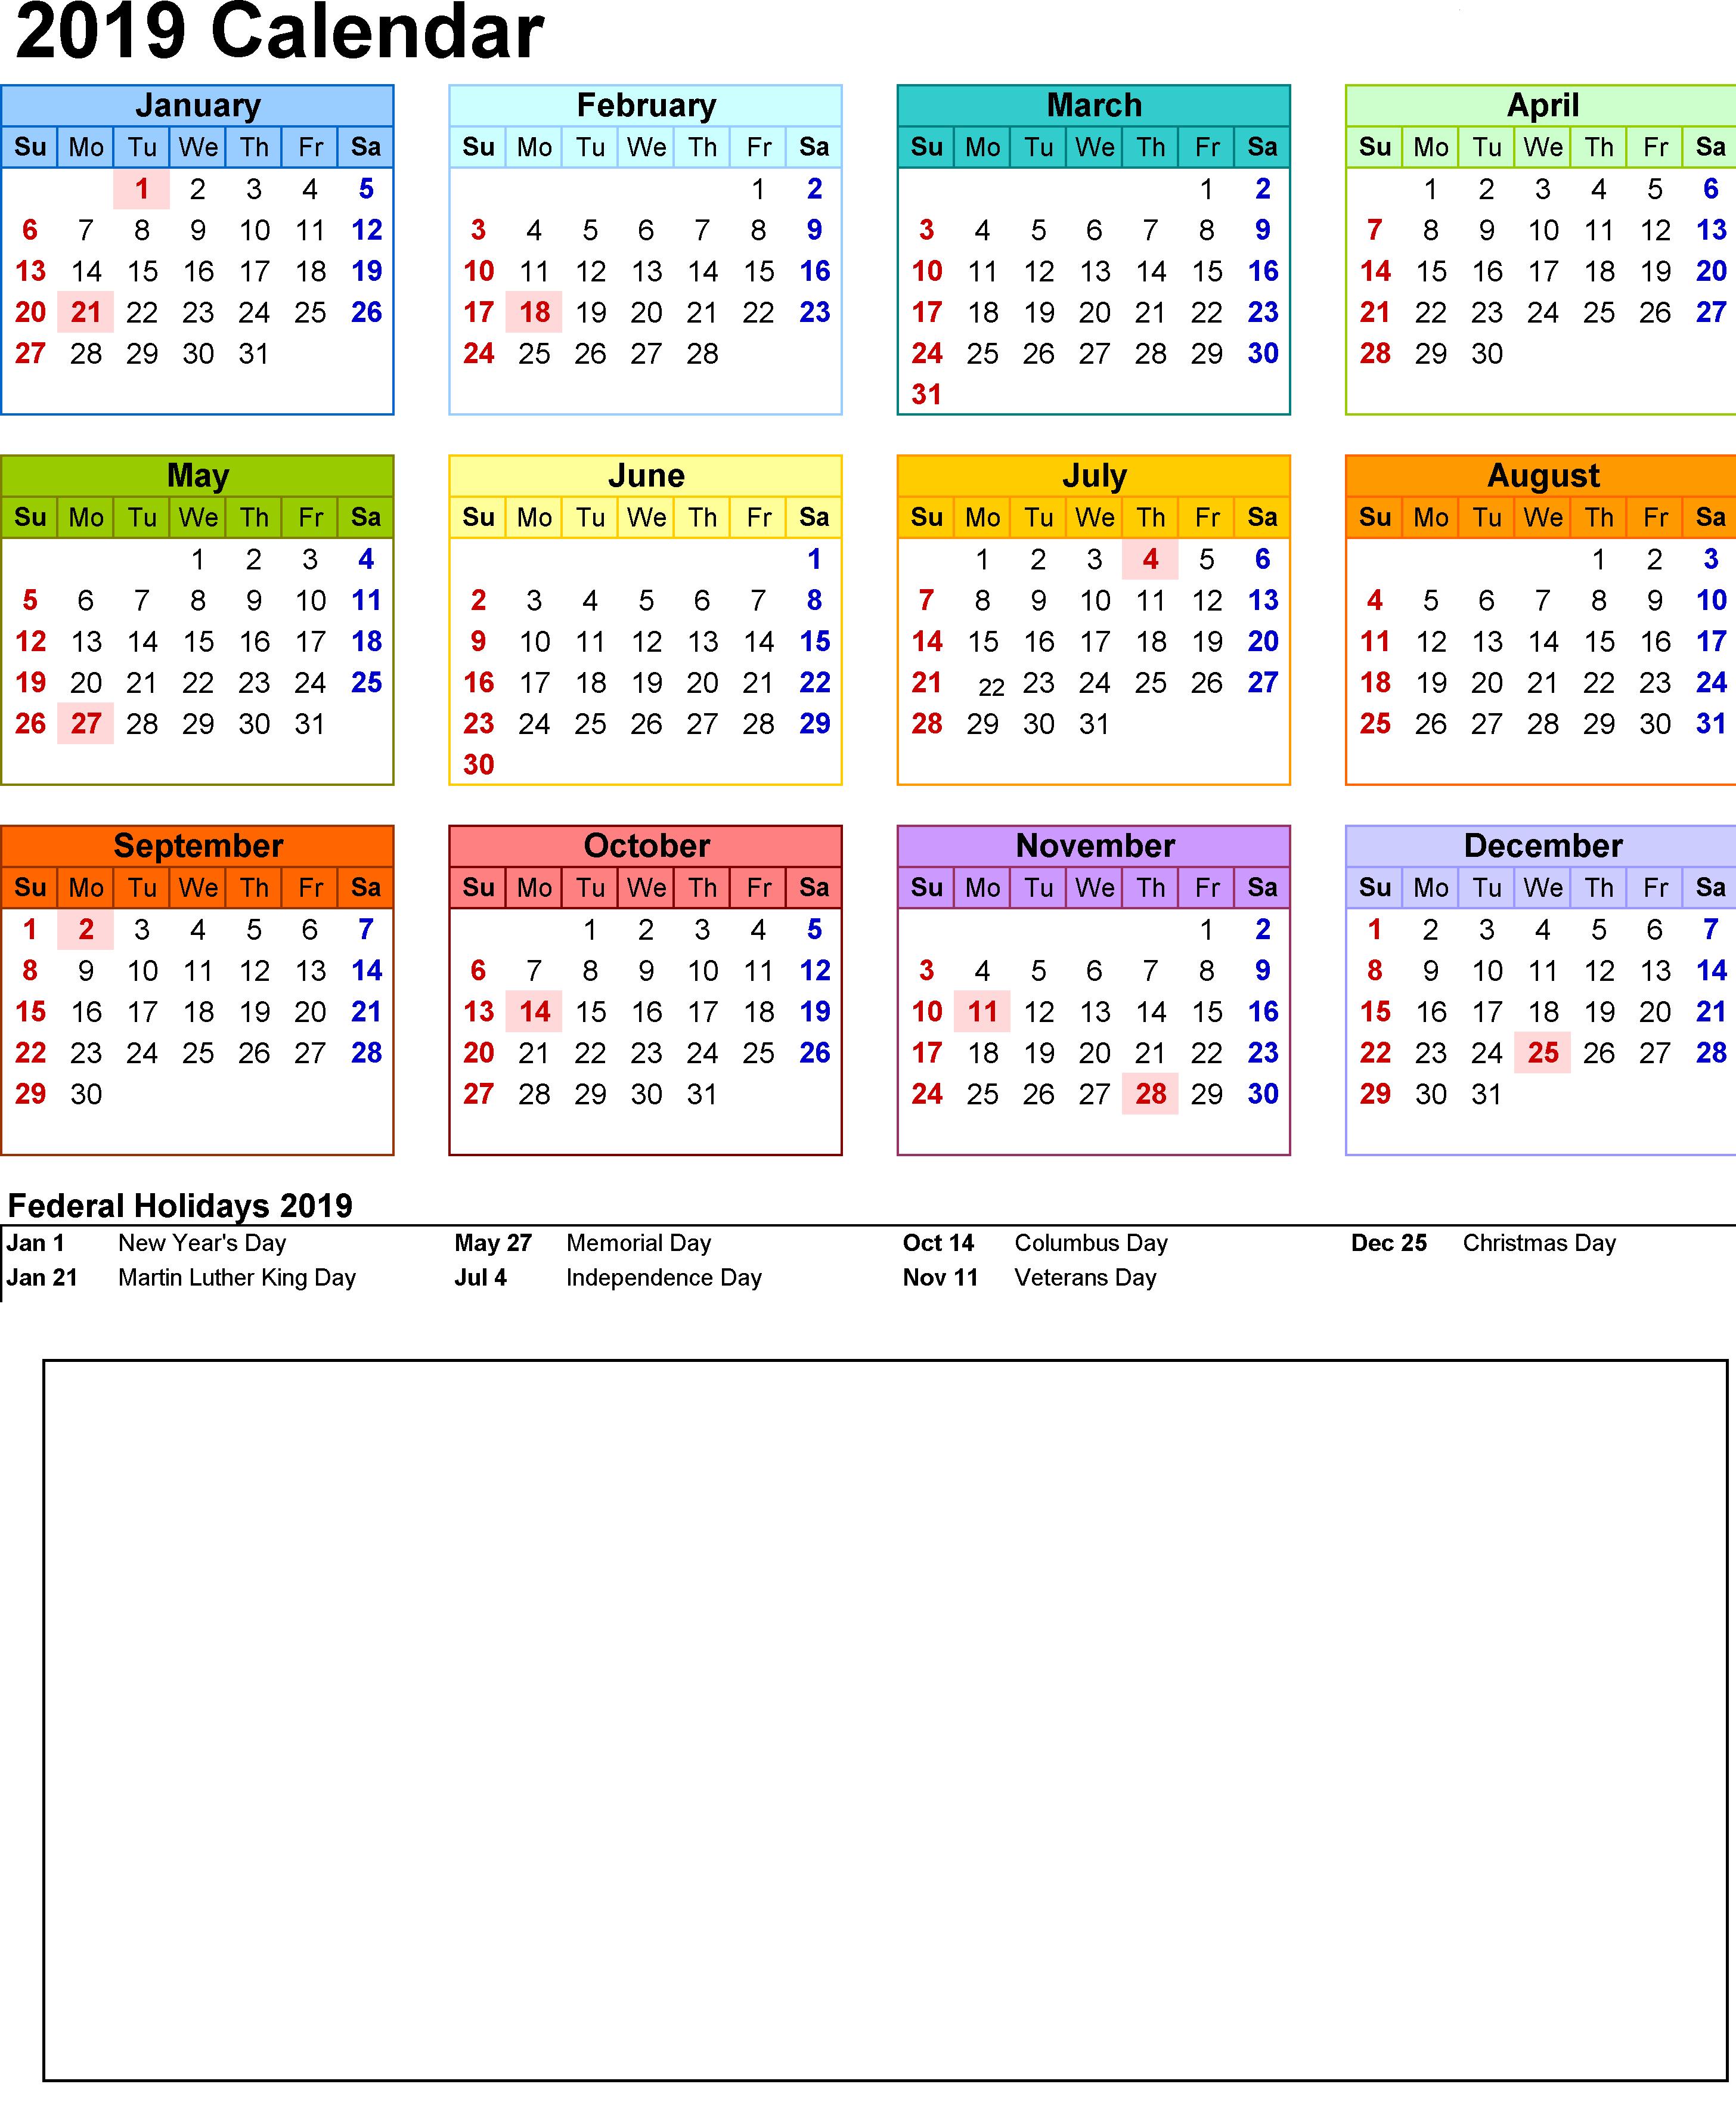 2019 Holiday Calendar   2019 Holiday Calendar In 2019   Federal Calendar 2019 Federal Holidays